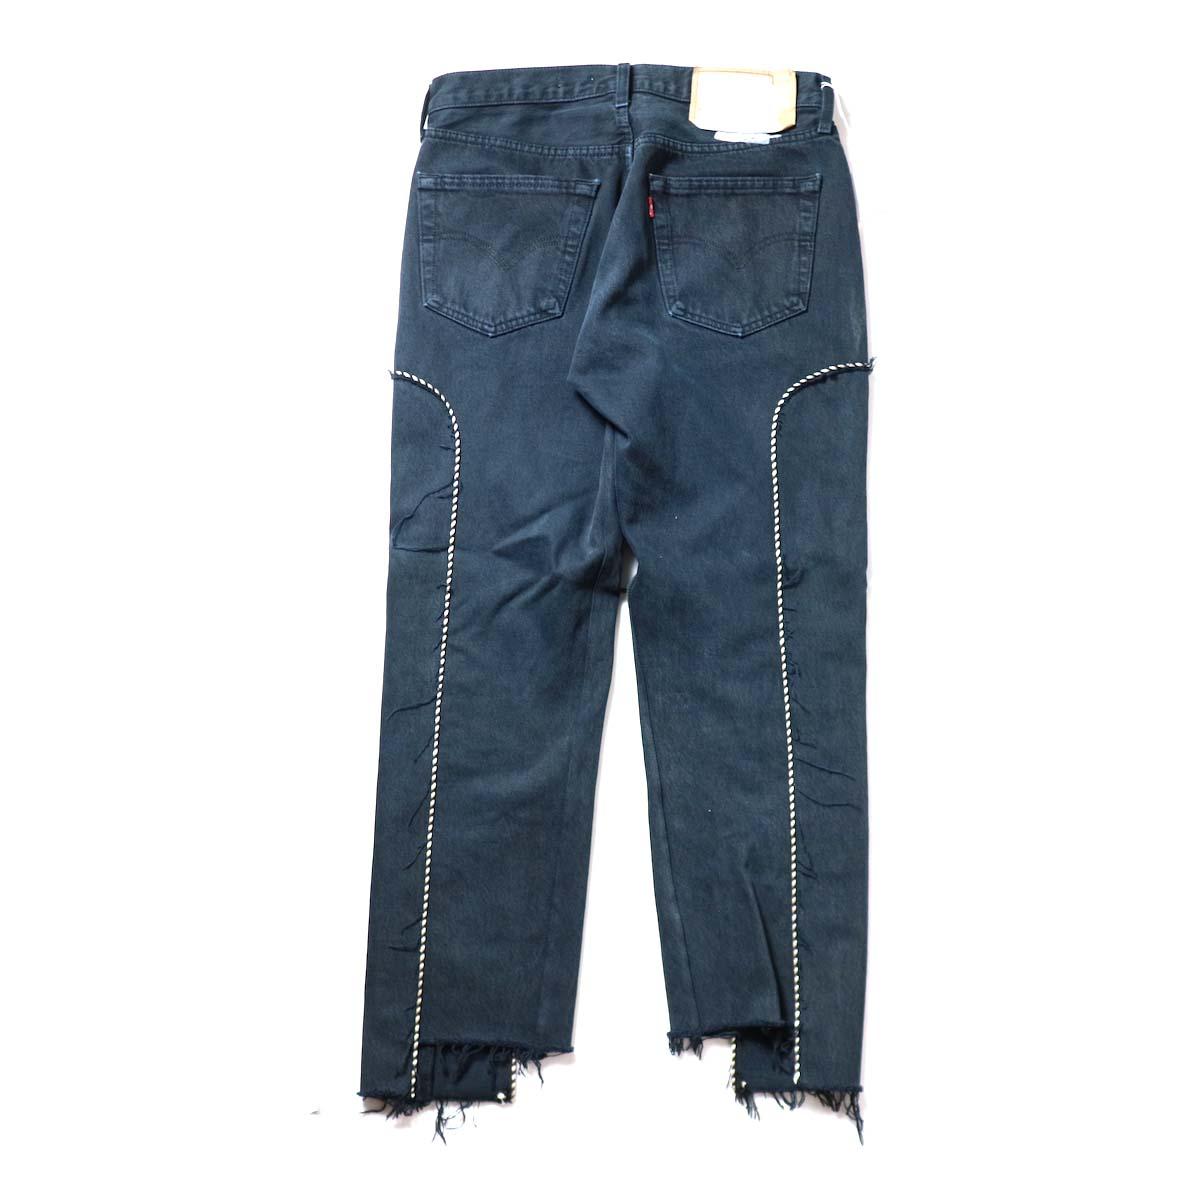 OLD PARK / Western Jeans Black (Msize-H)背面